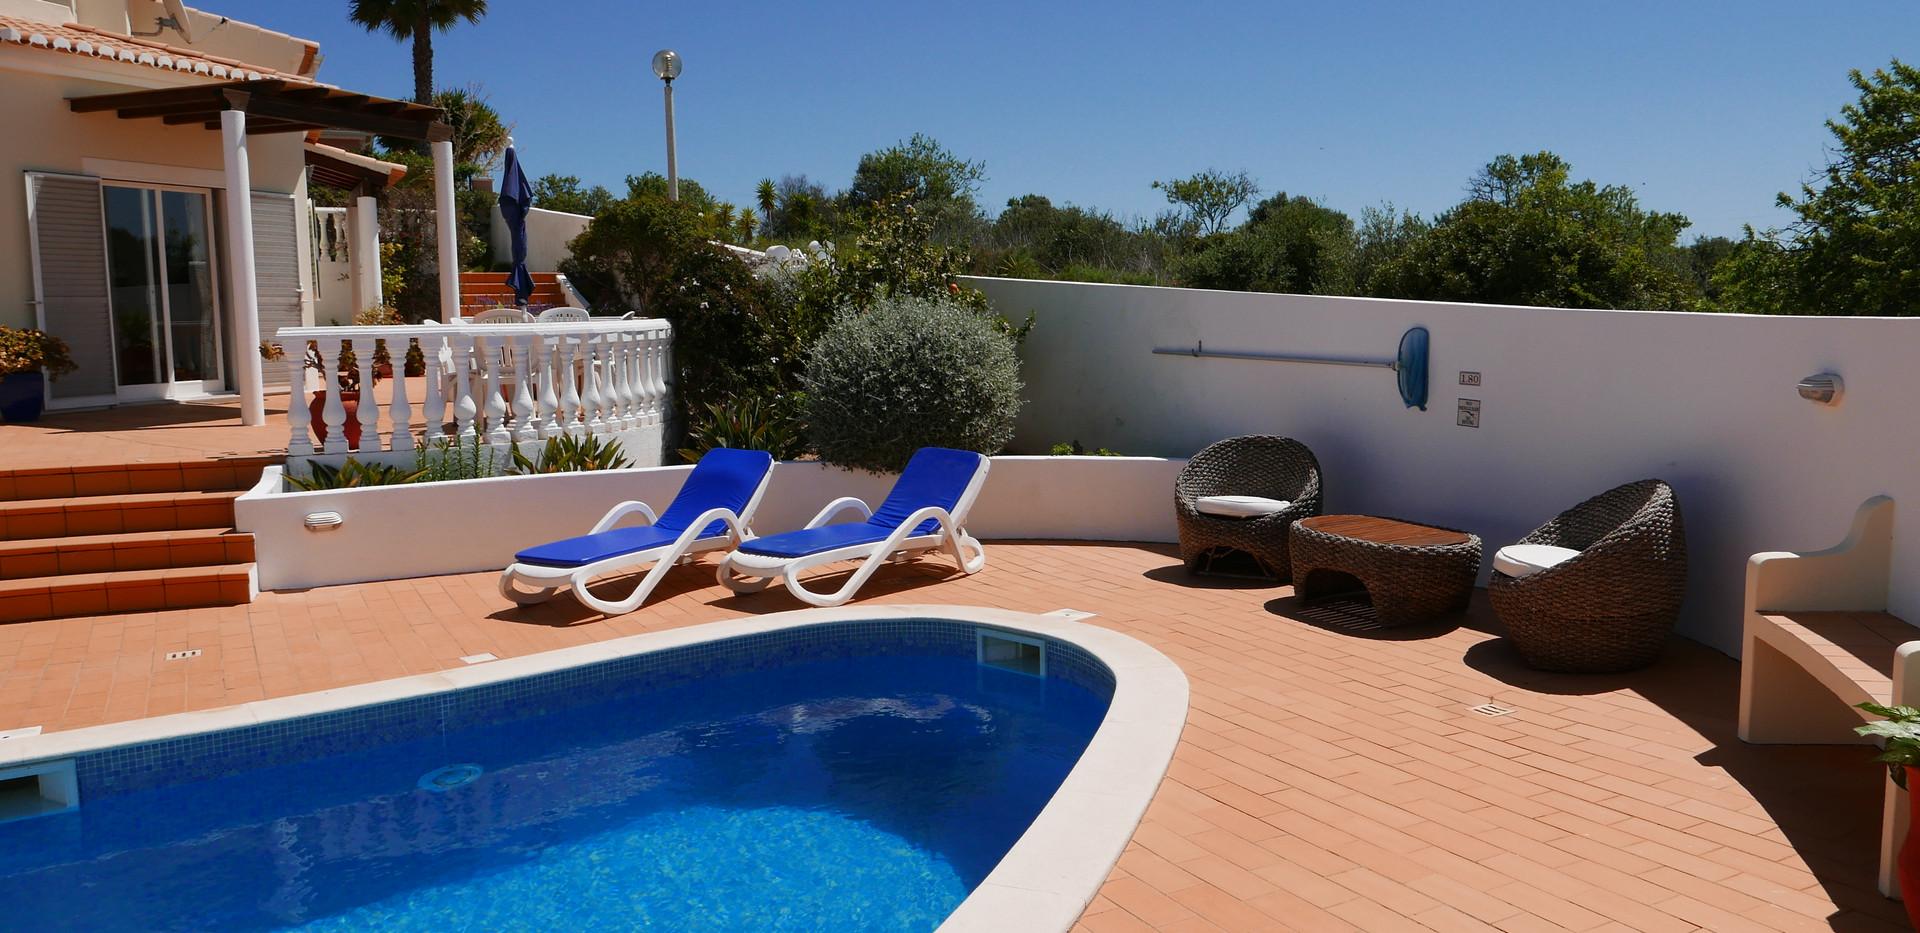 Villa pool 07.JPG